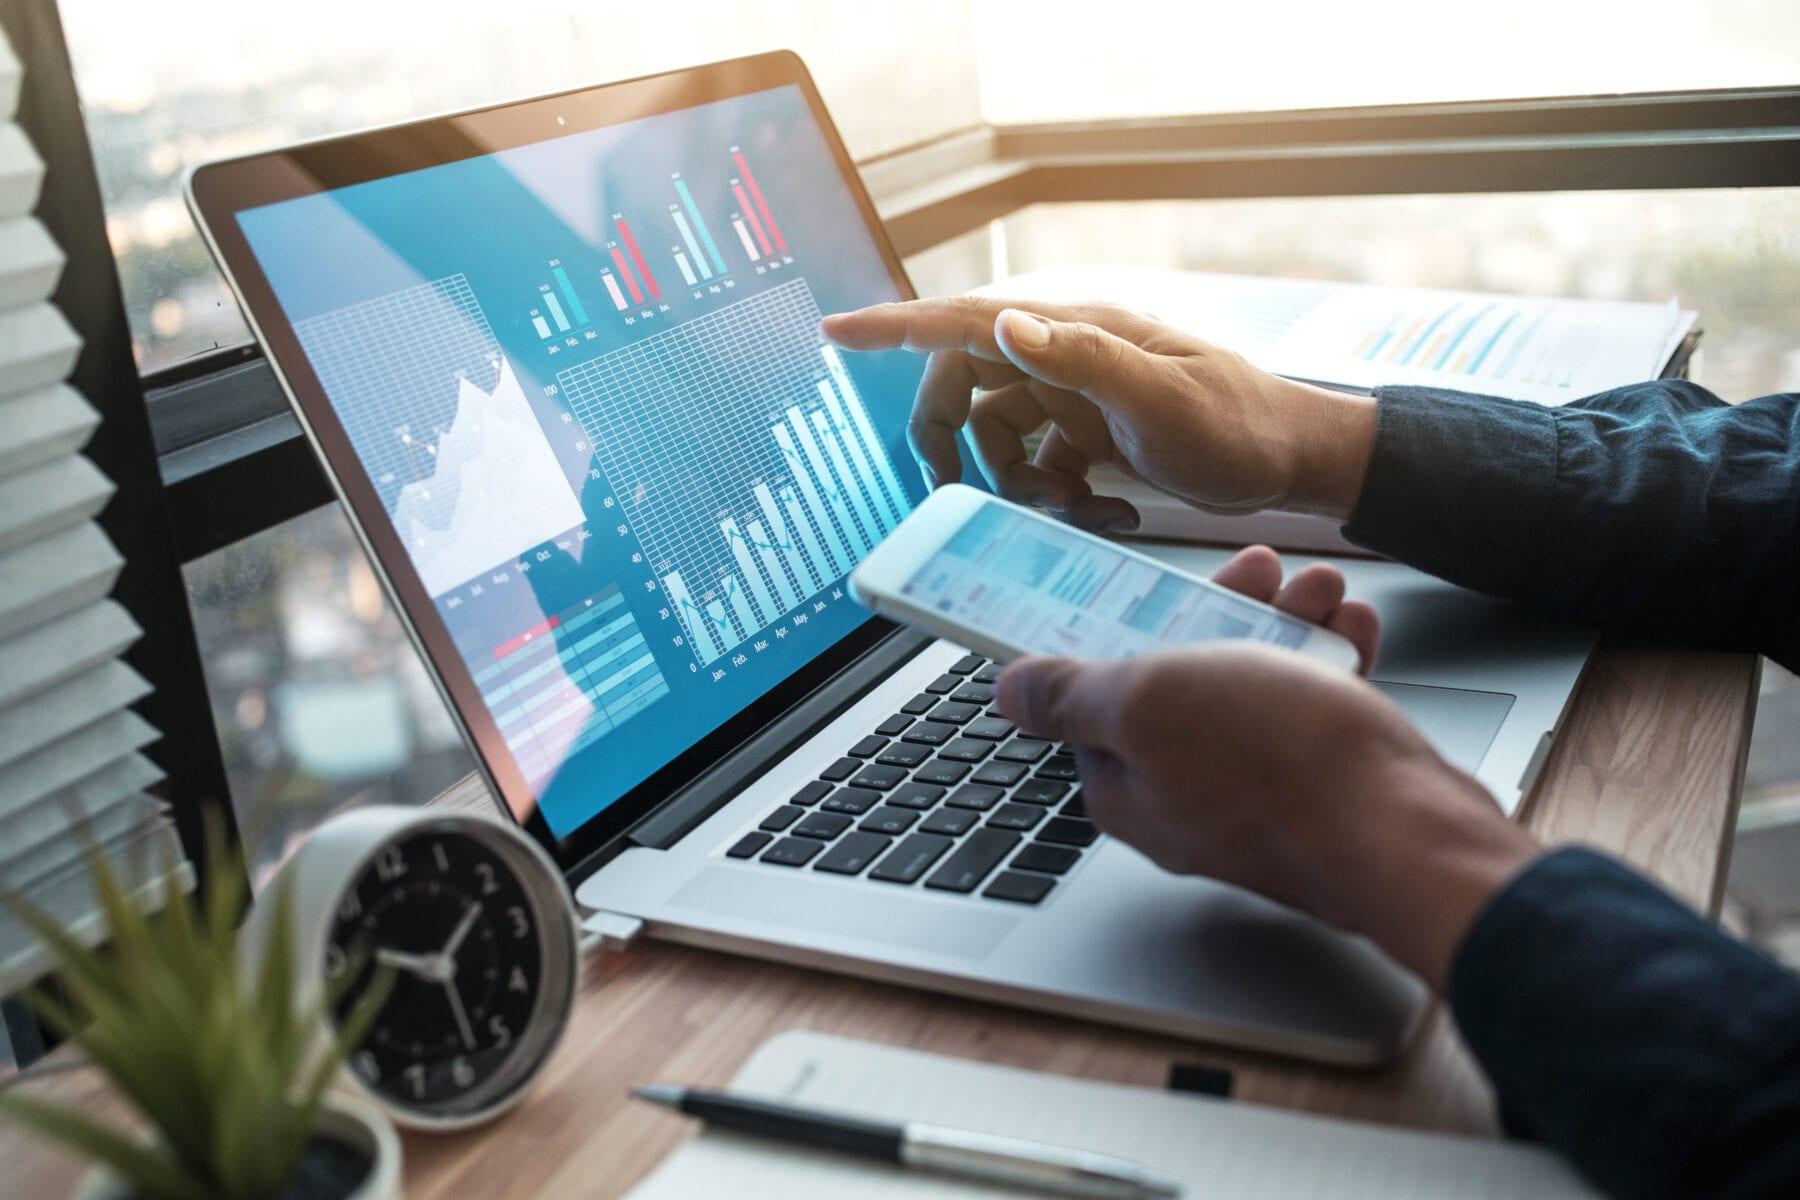 amazon brand analytics features and benefits